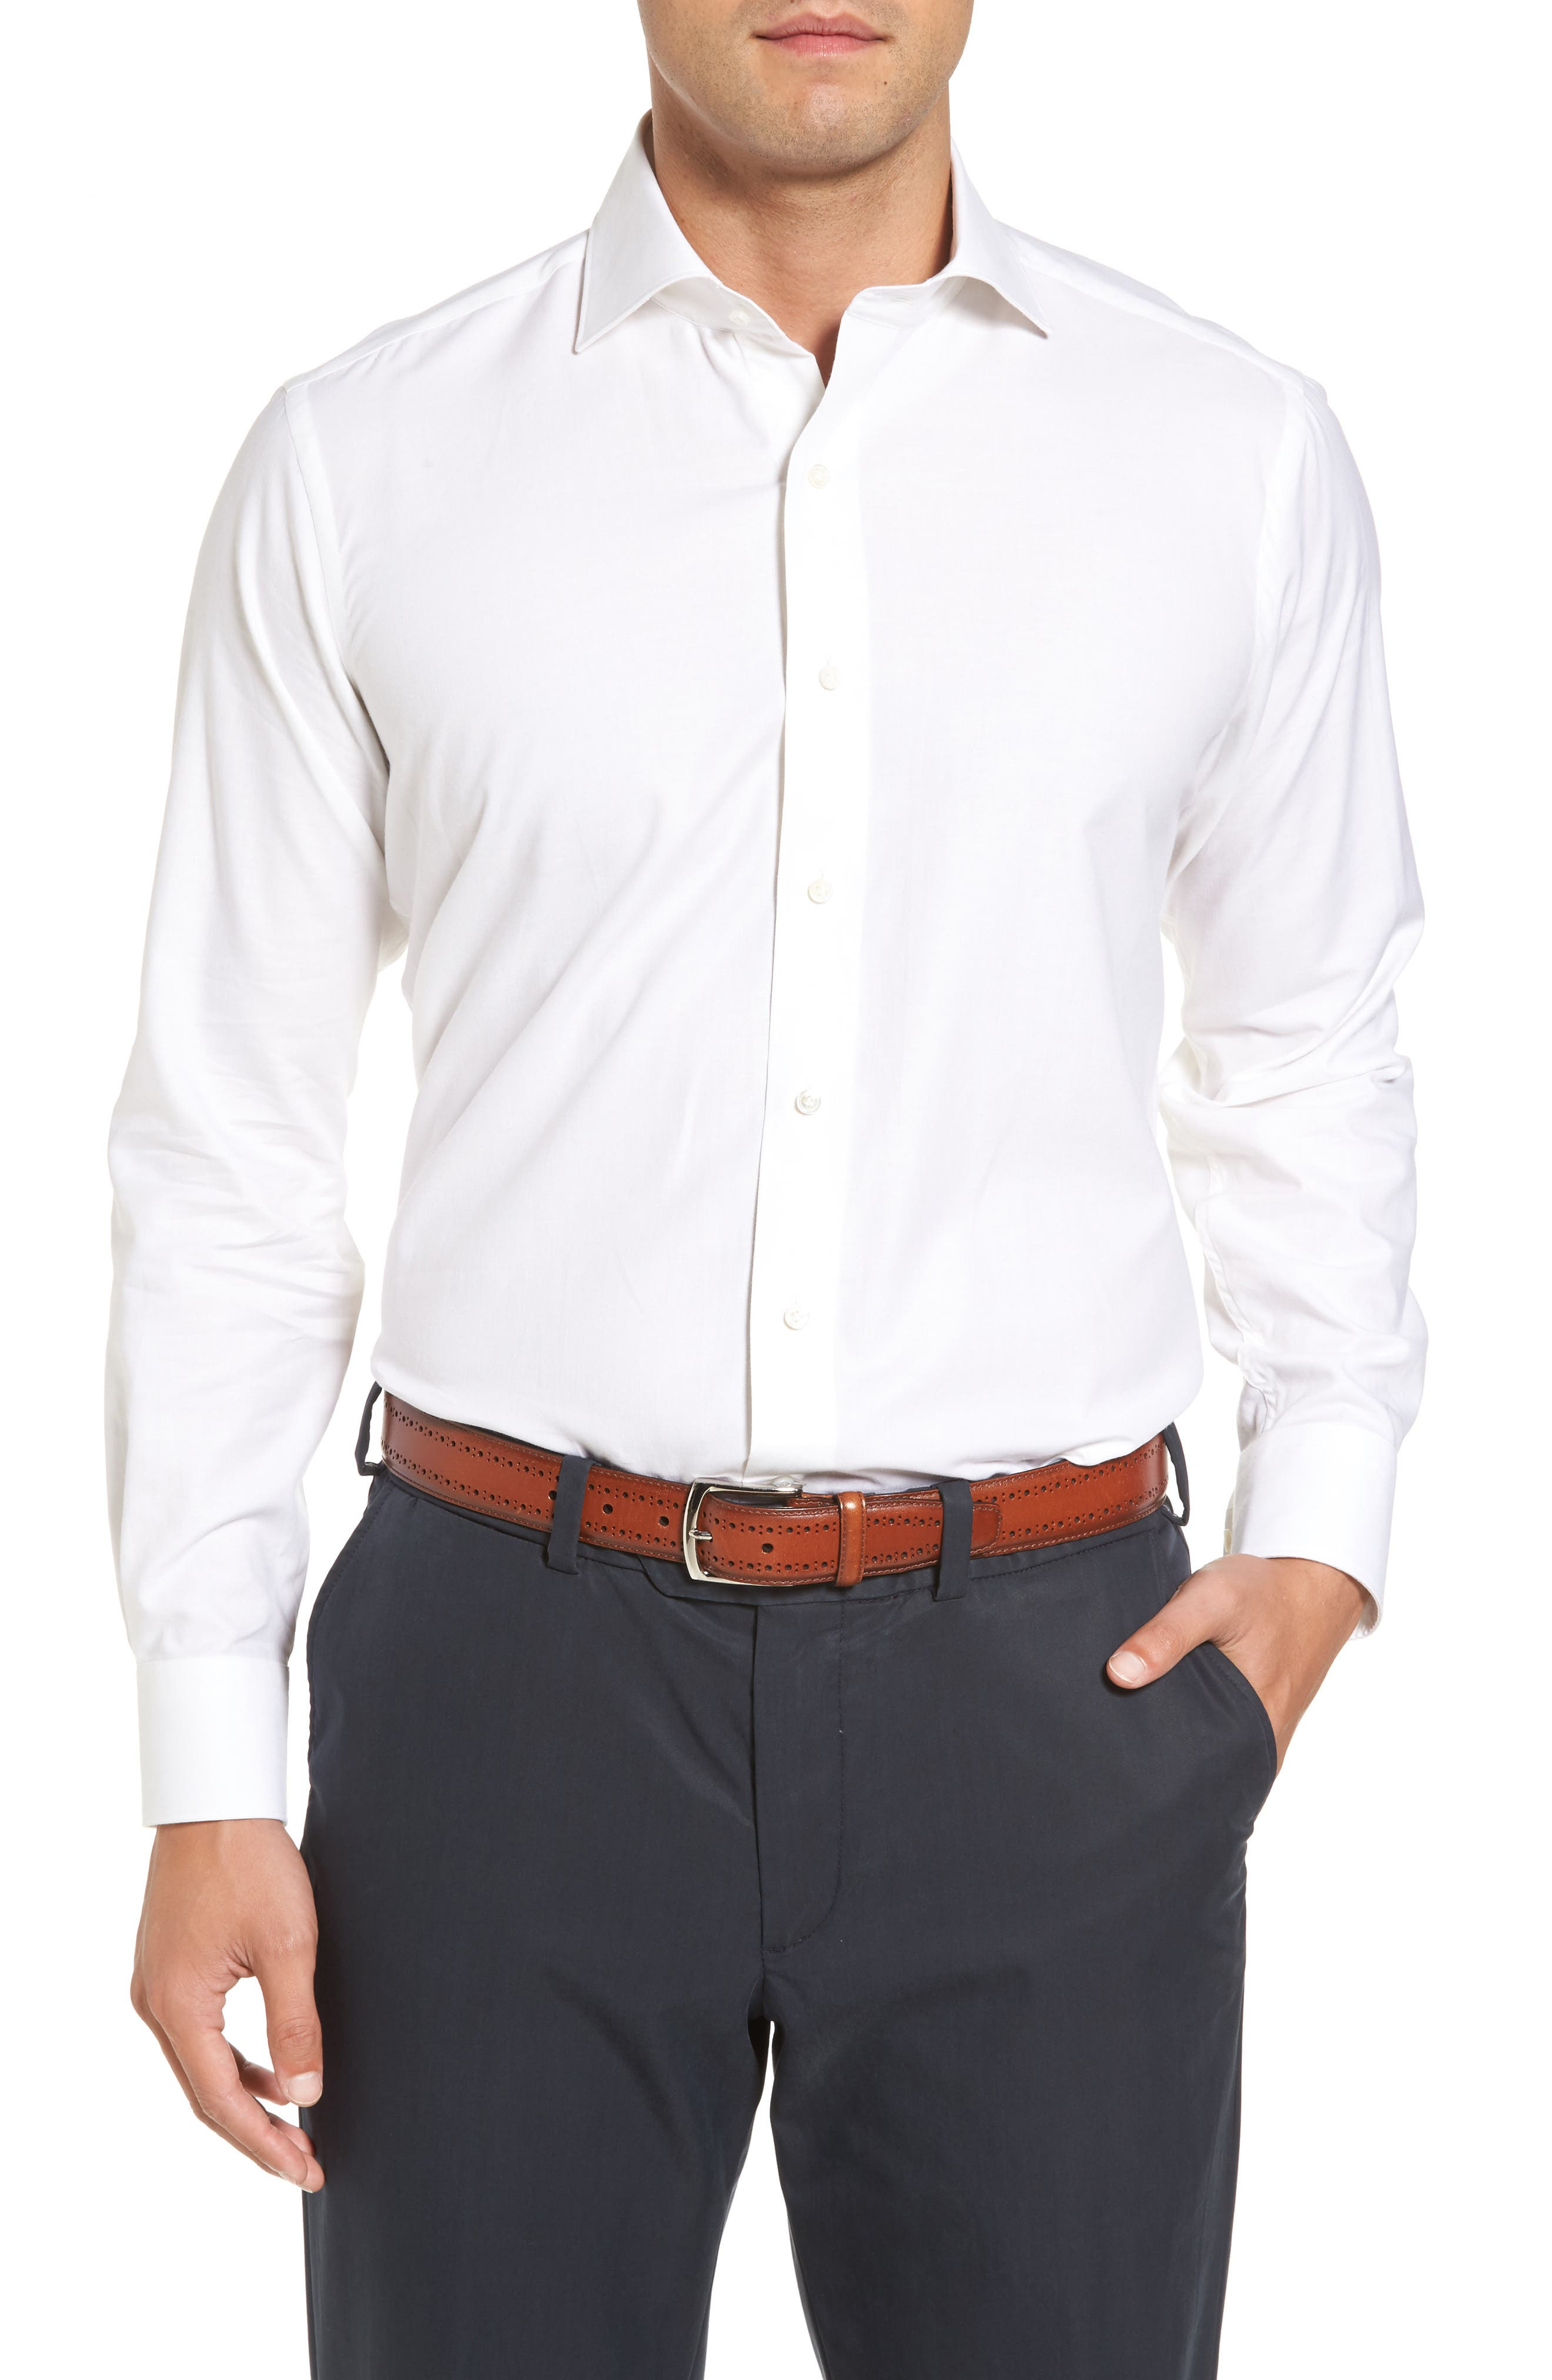 Silky Touch Herringbone Sport Shirt,                         Main,                         color, 100